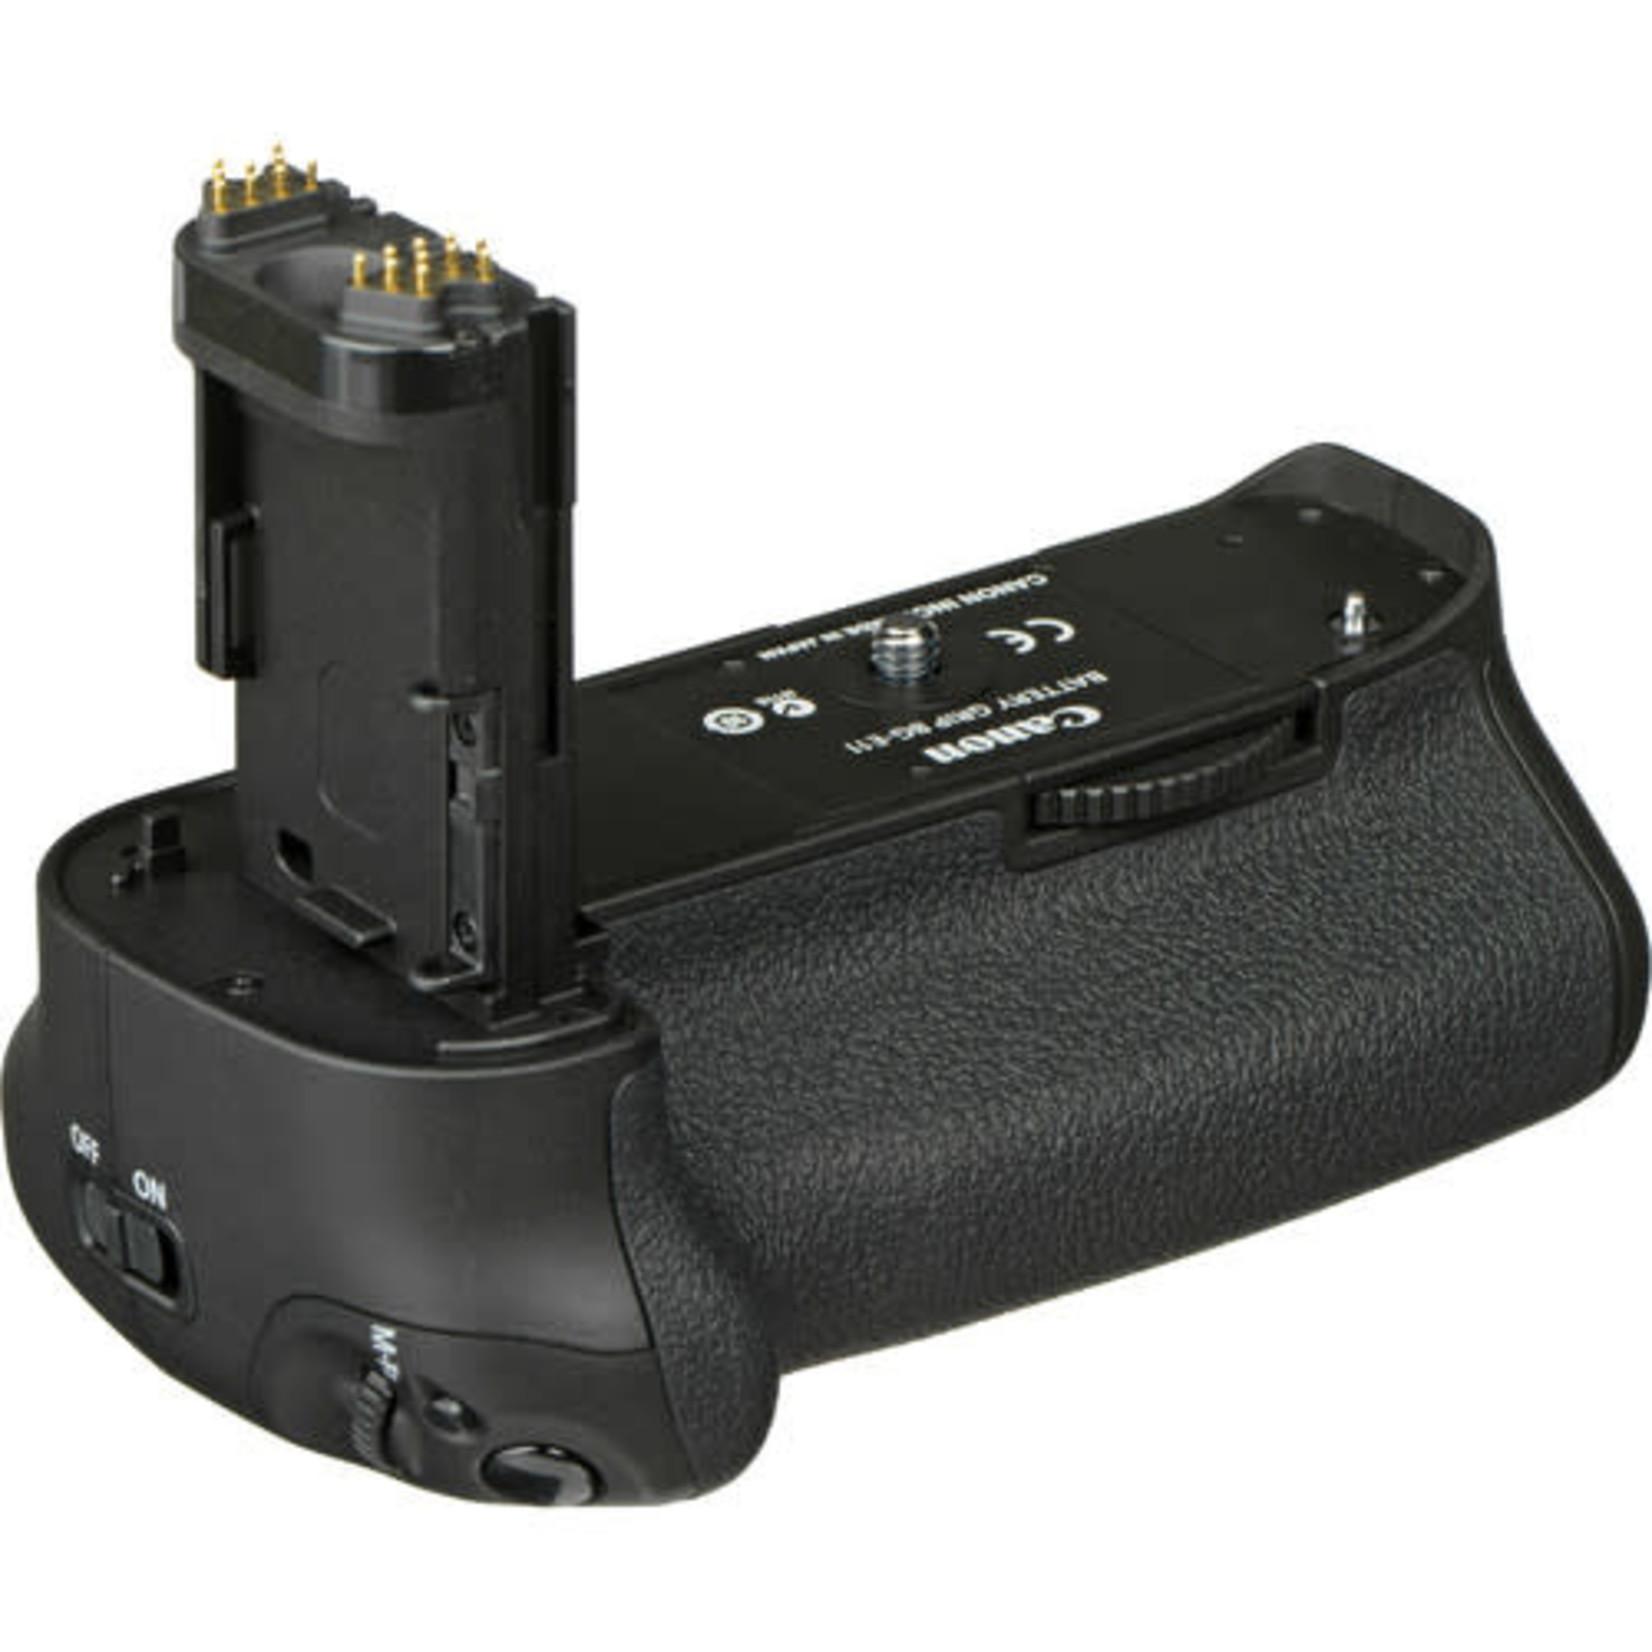 Canon Canon BG-E11 Battery Grip for EOS 5D Mark III, 5DS, & 5DS R